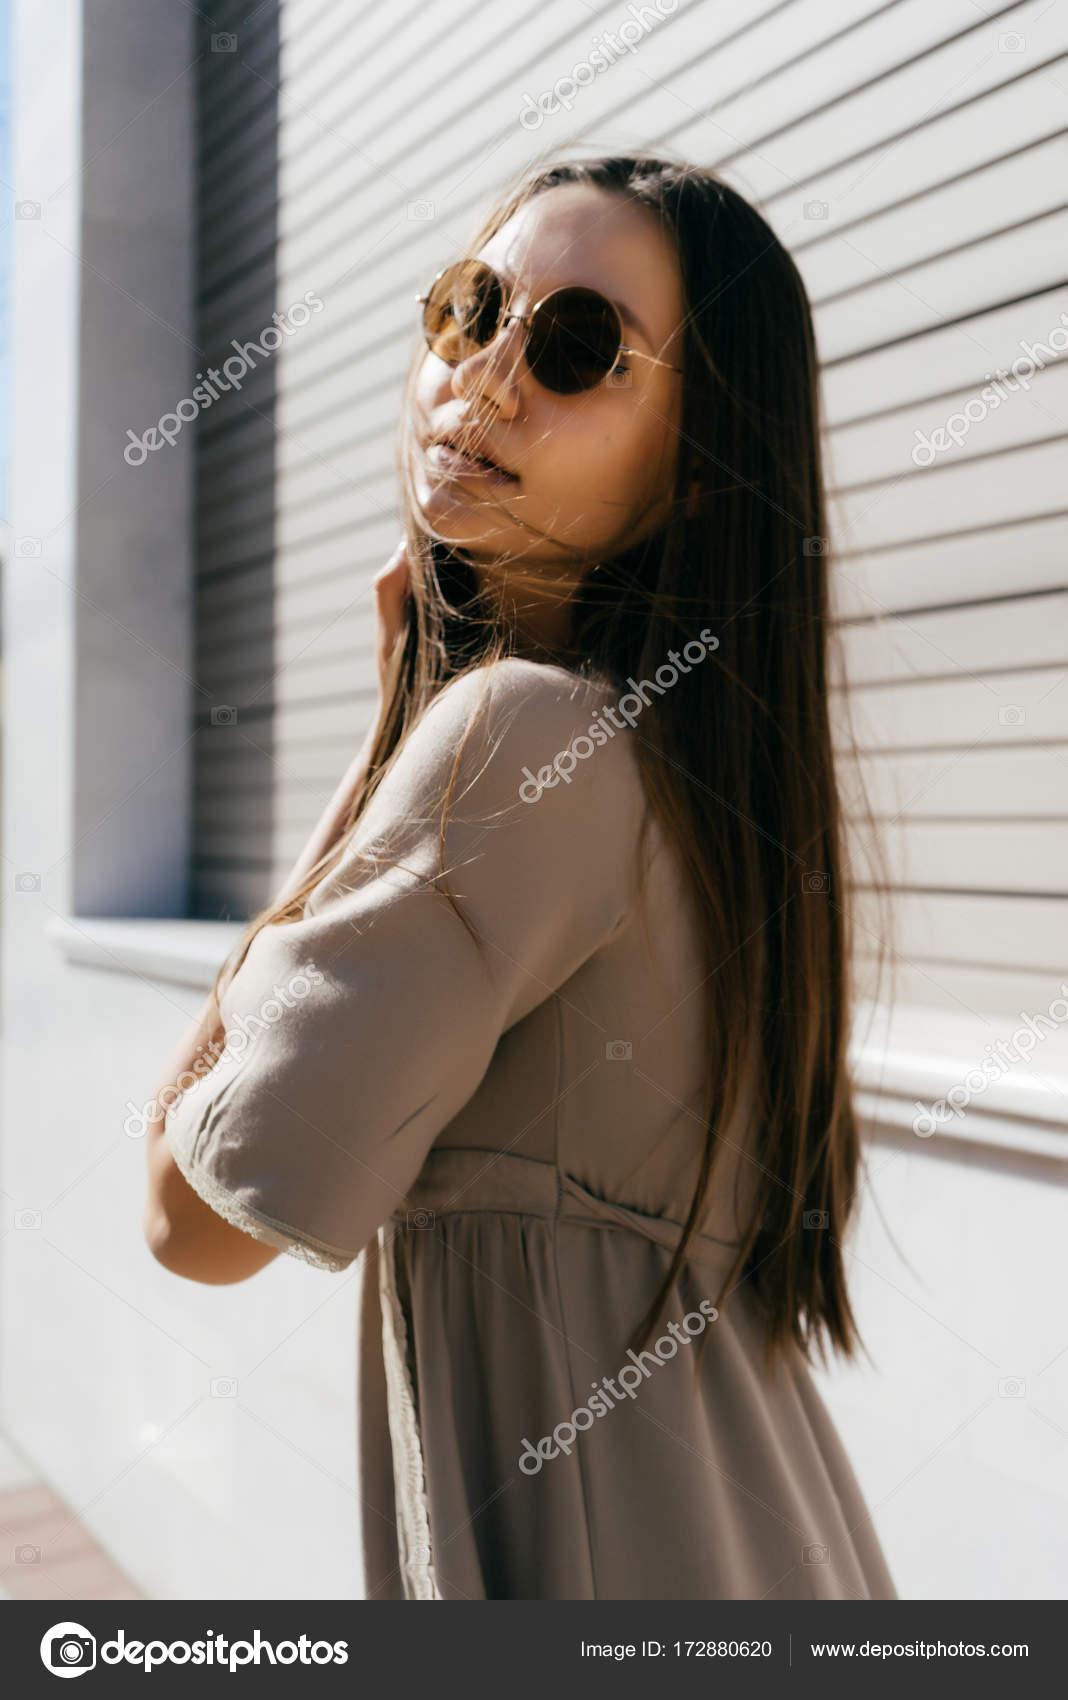 5eb70b77cc ελκυστική κοπέλα σε ένα μπεζ φόρεμα